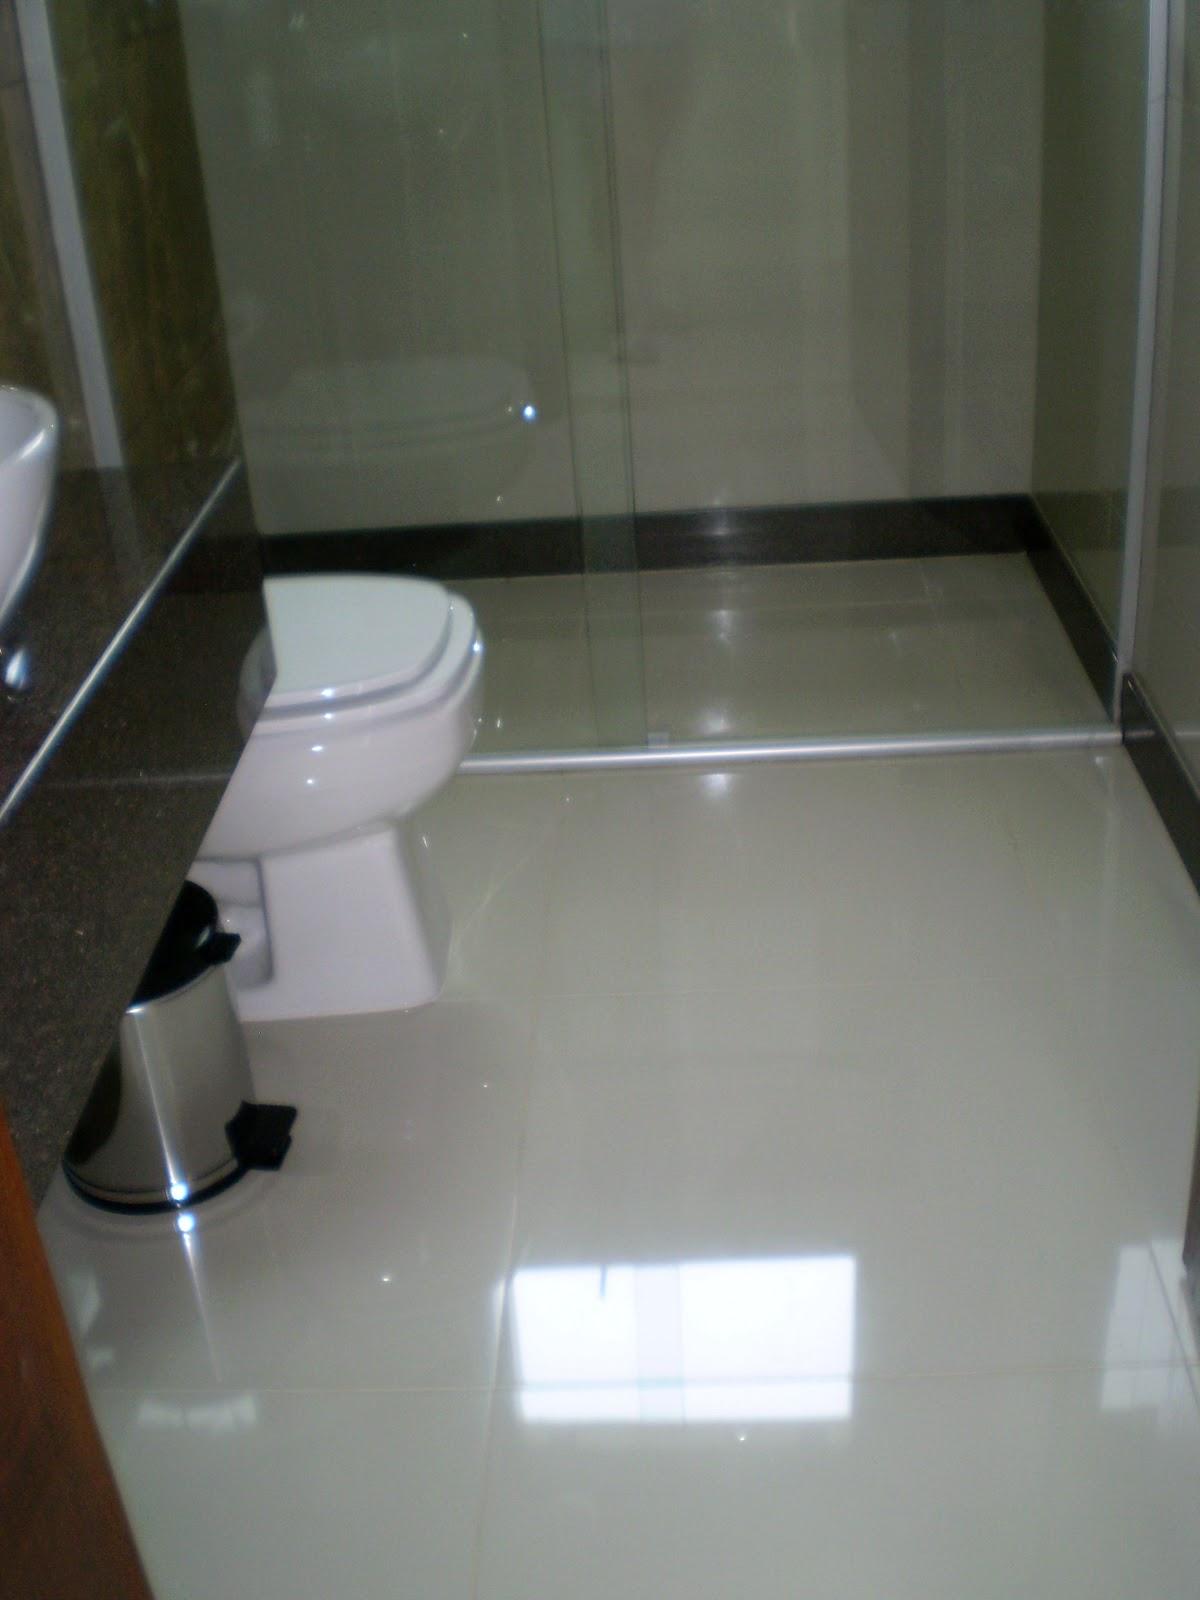 Sala Com Porcelanato Polido Formas De Pagamento Ladrilho Para Sala  -> Sala Com O Piso Porcelanato Polido Cinza